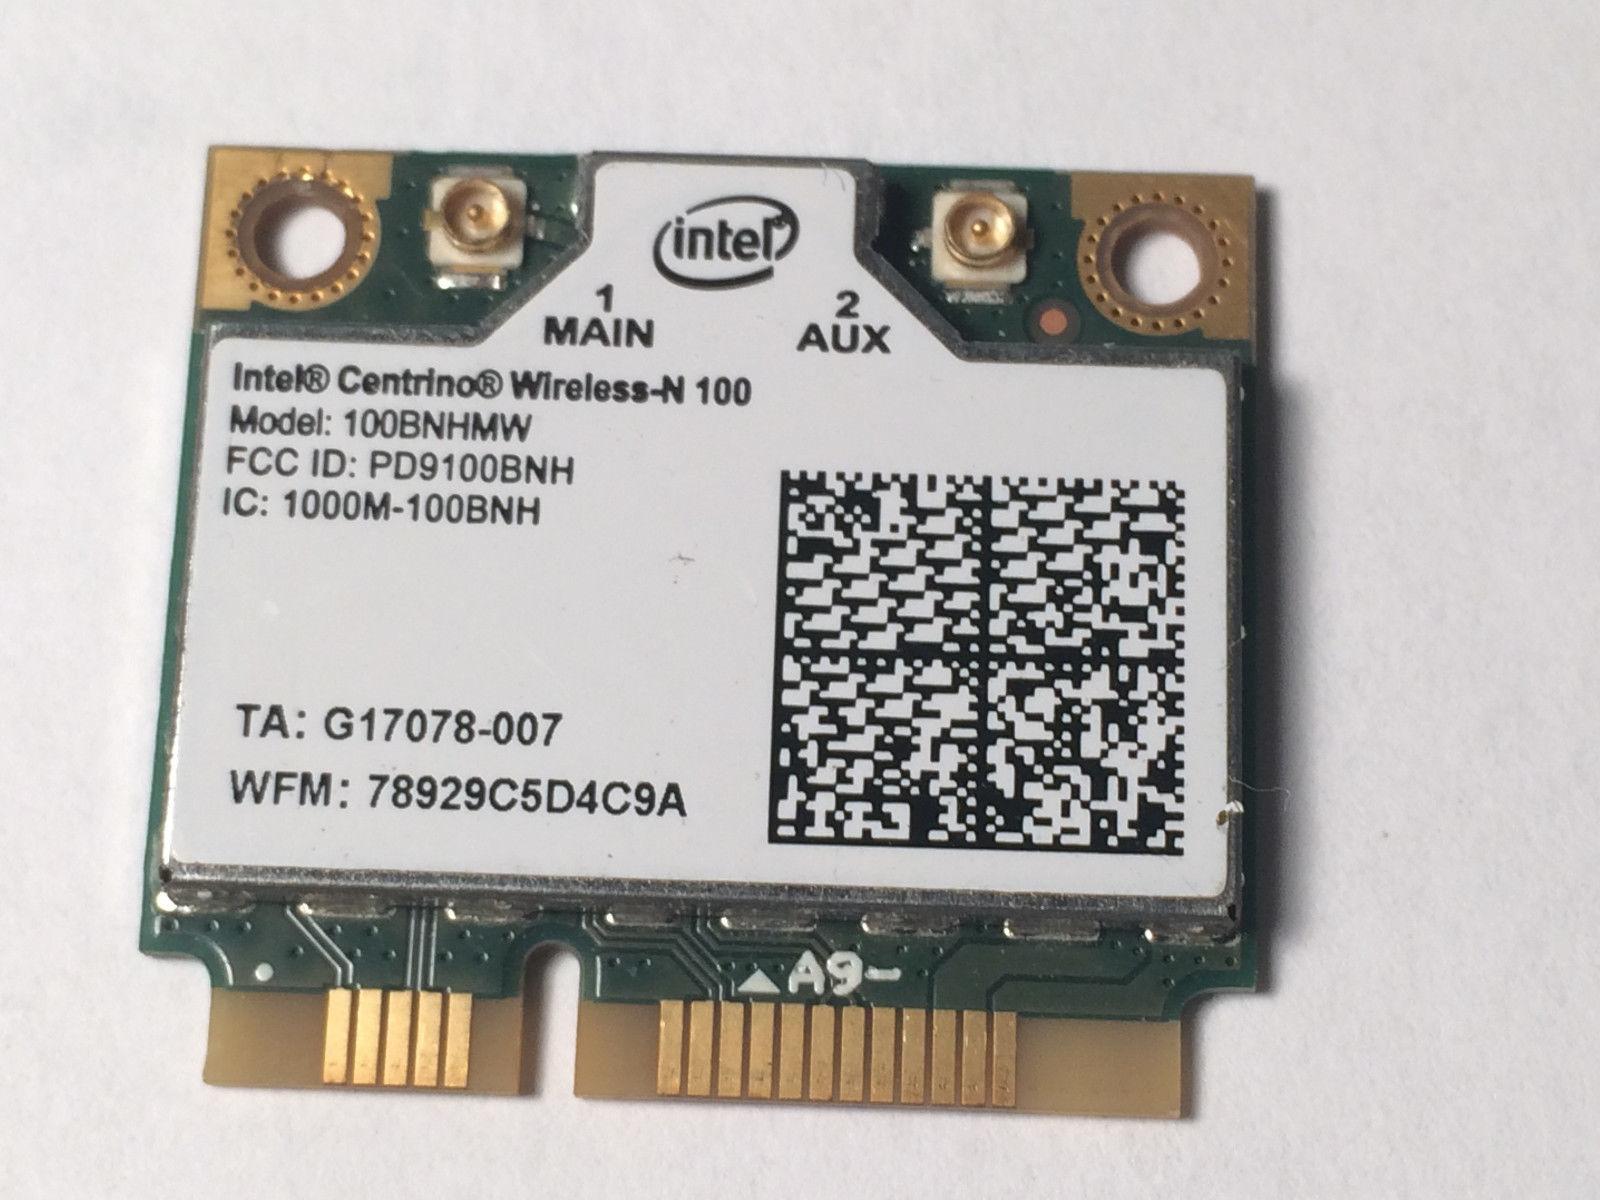 Intel Centrino Wireless-N 100 b/g/n 100BNHMW b/g/n PCI-E Half Mini WiFi Card